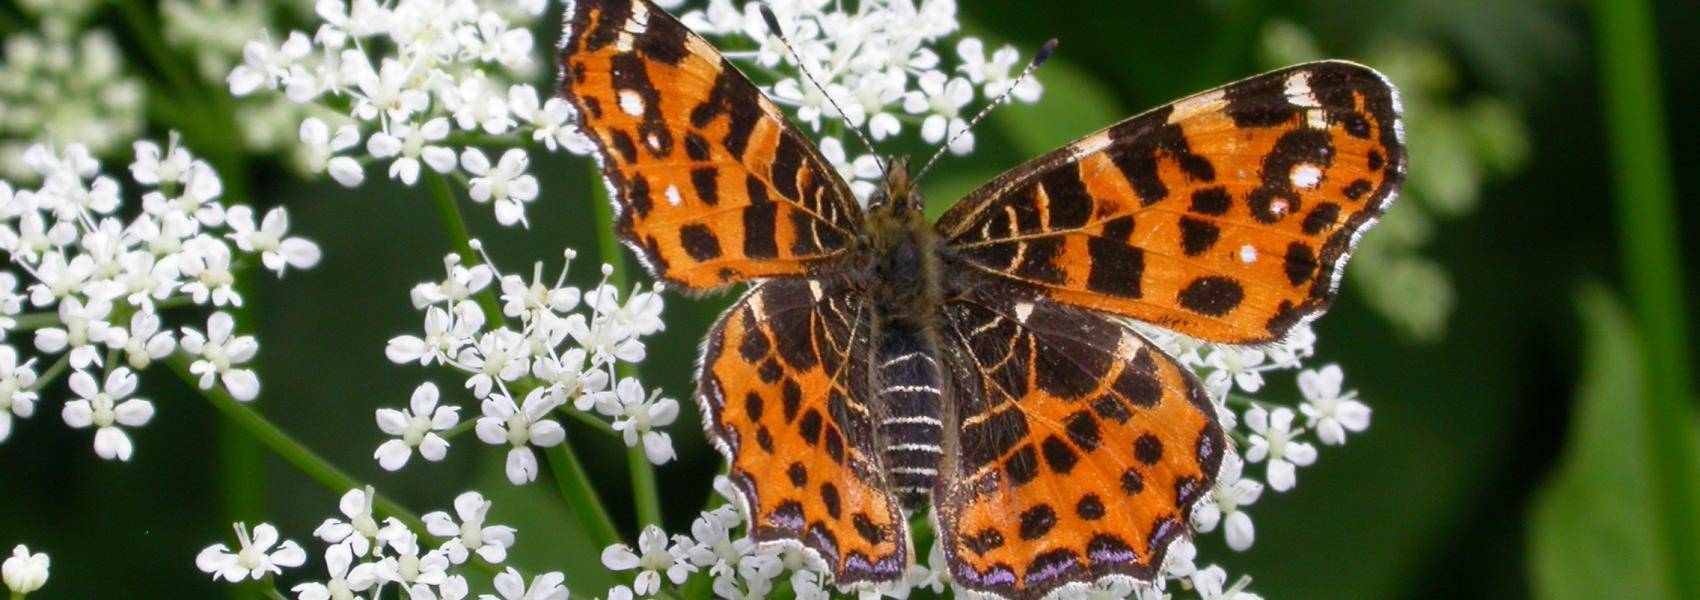 landkaartje (vlinder)